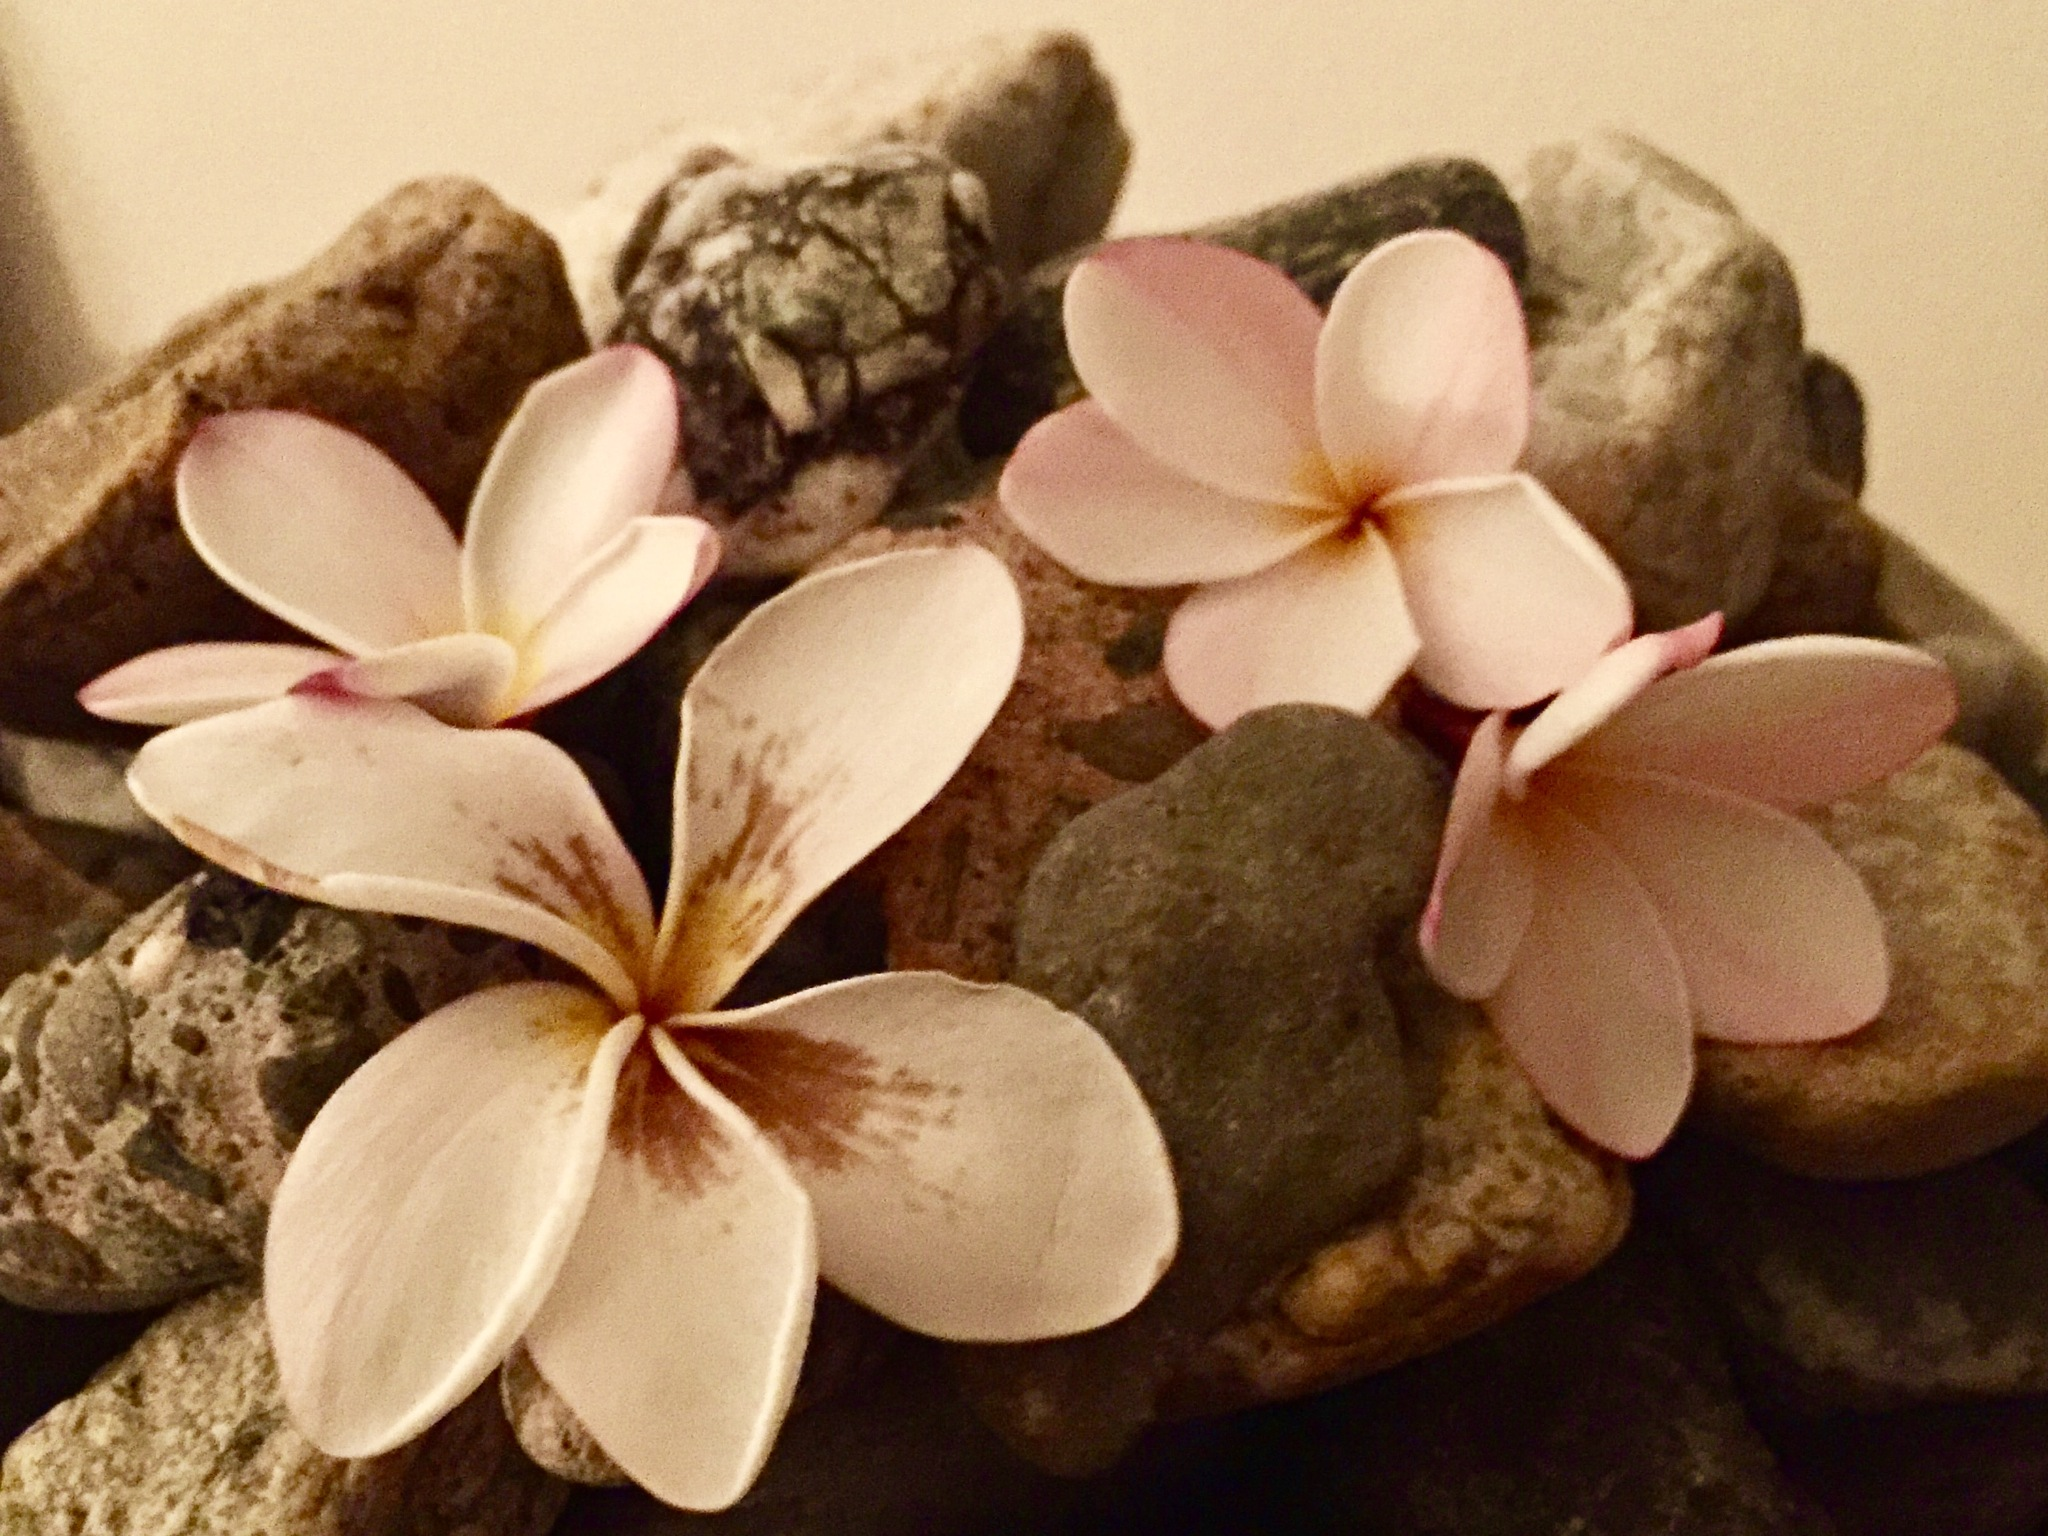 Plumeria on the rocks by maryann.mishko